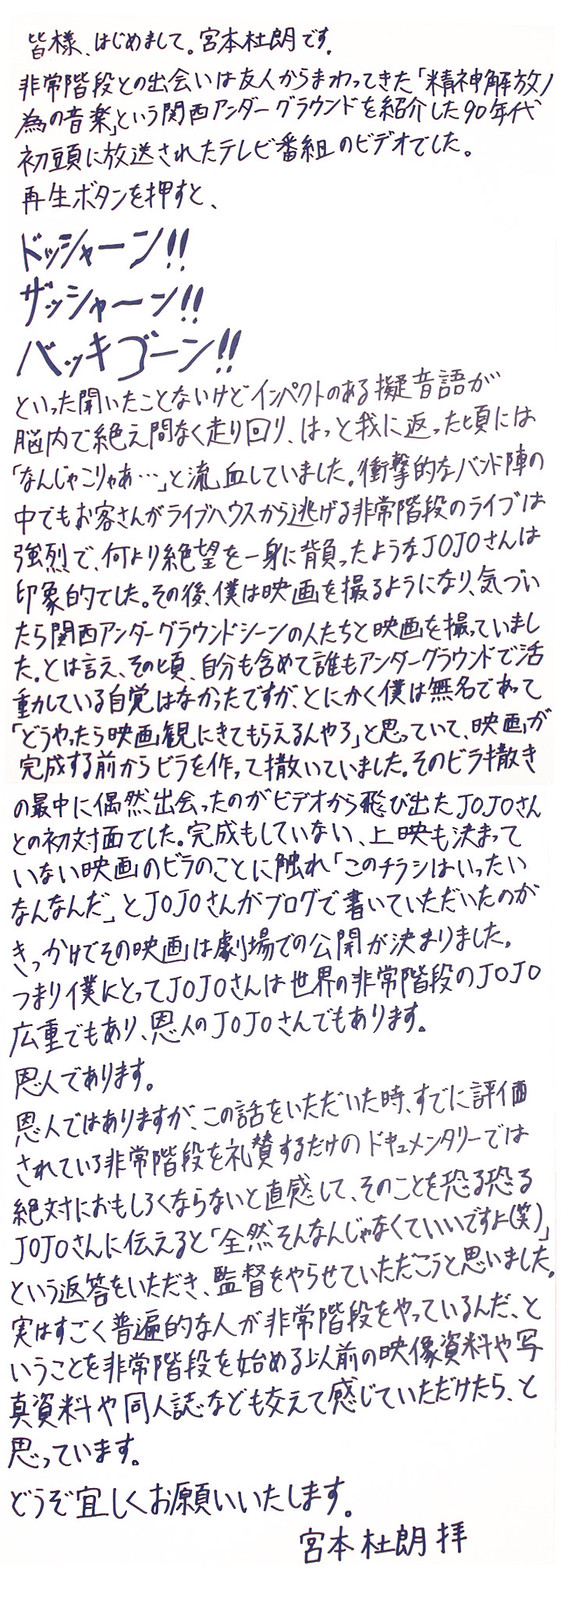 hijokaidan_campfire_miyamoto_pre